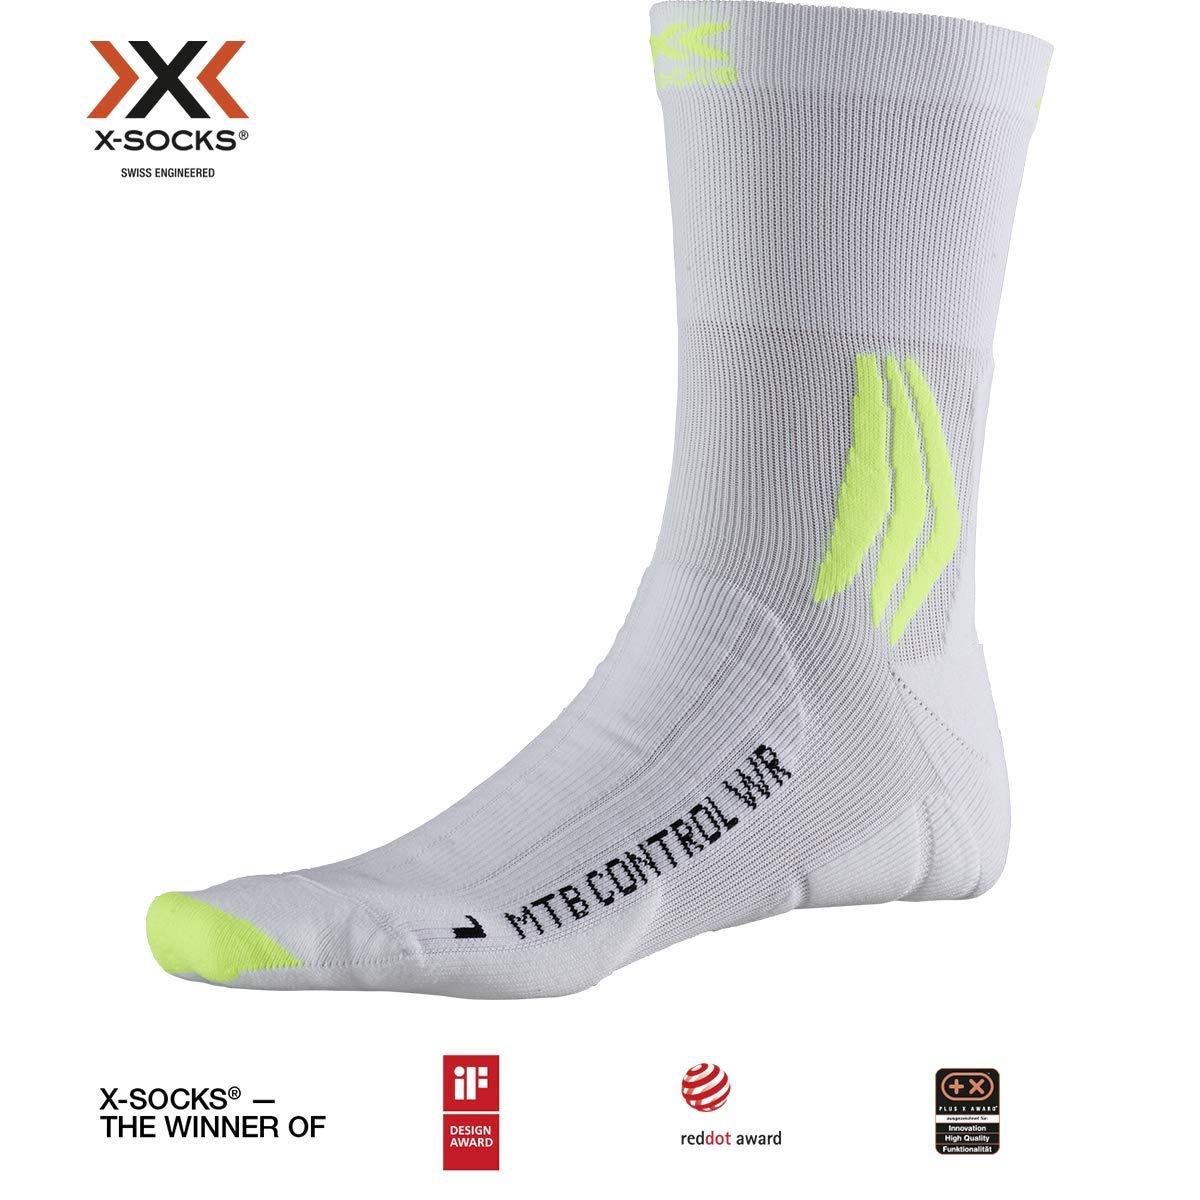 Unisex Adulto X-Socks Mountain Bike Control Water Resistant Socks